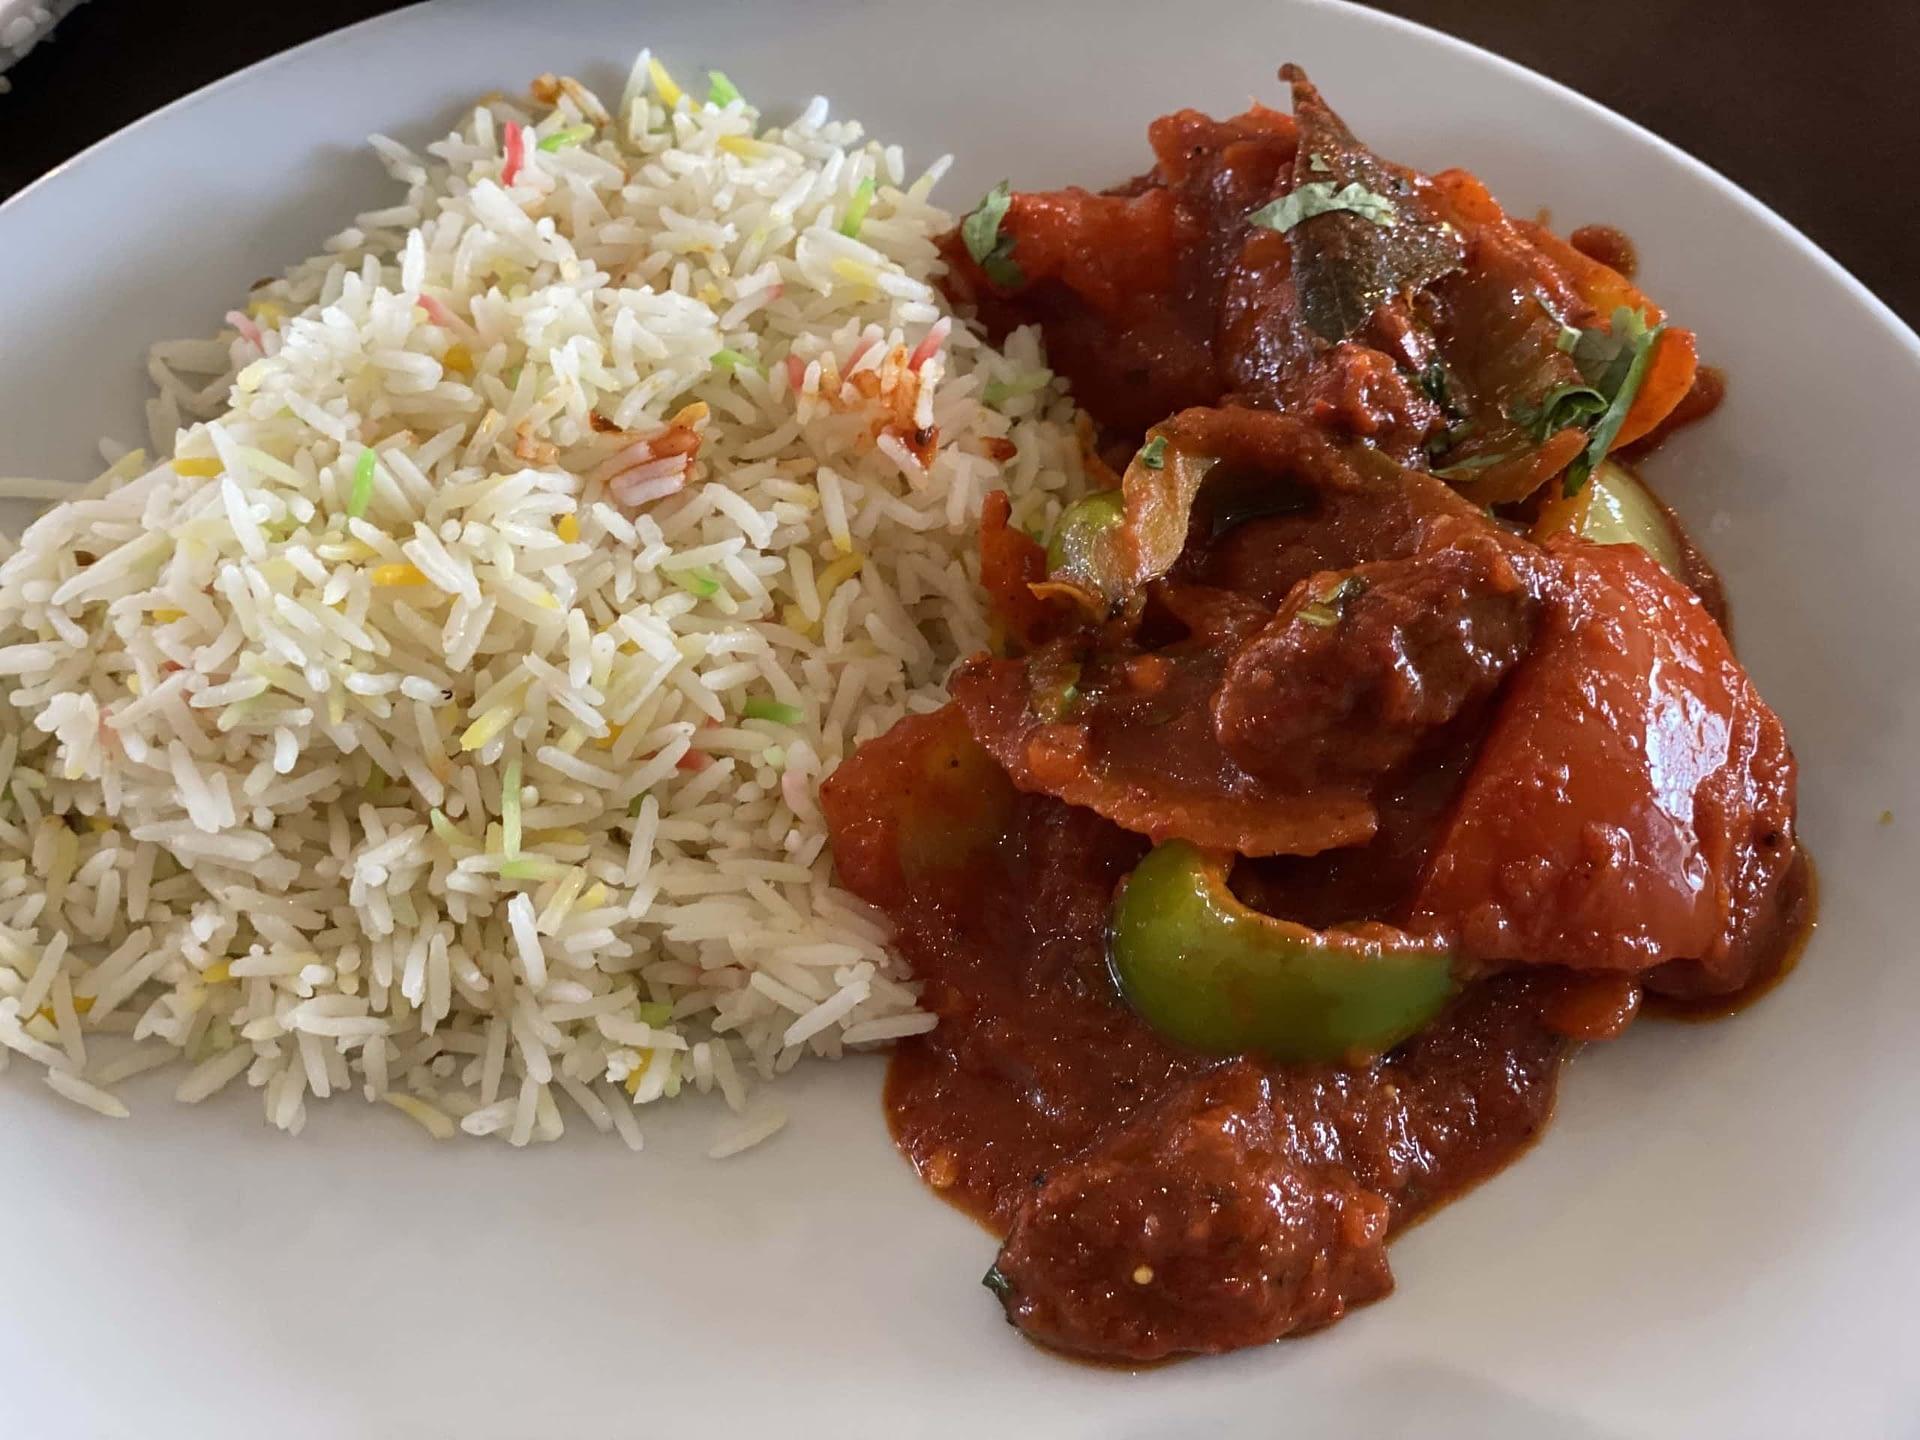 Lamb Balti & Pilau Rice at Bombay 8 Restaurant